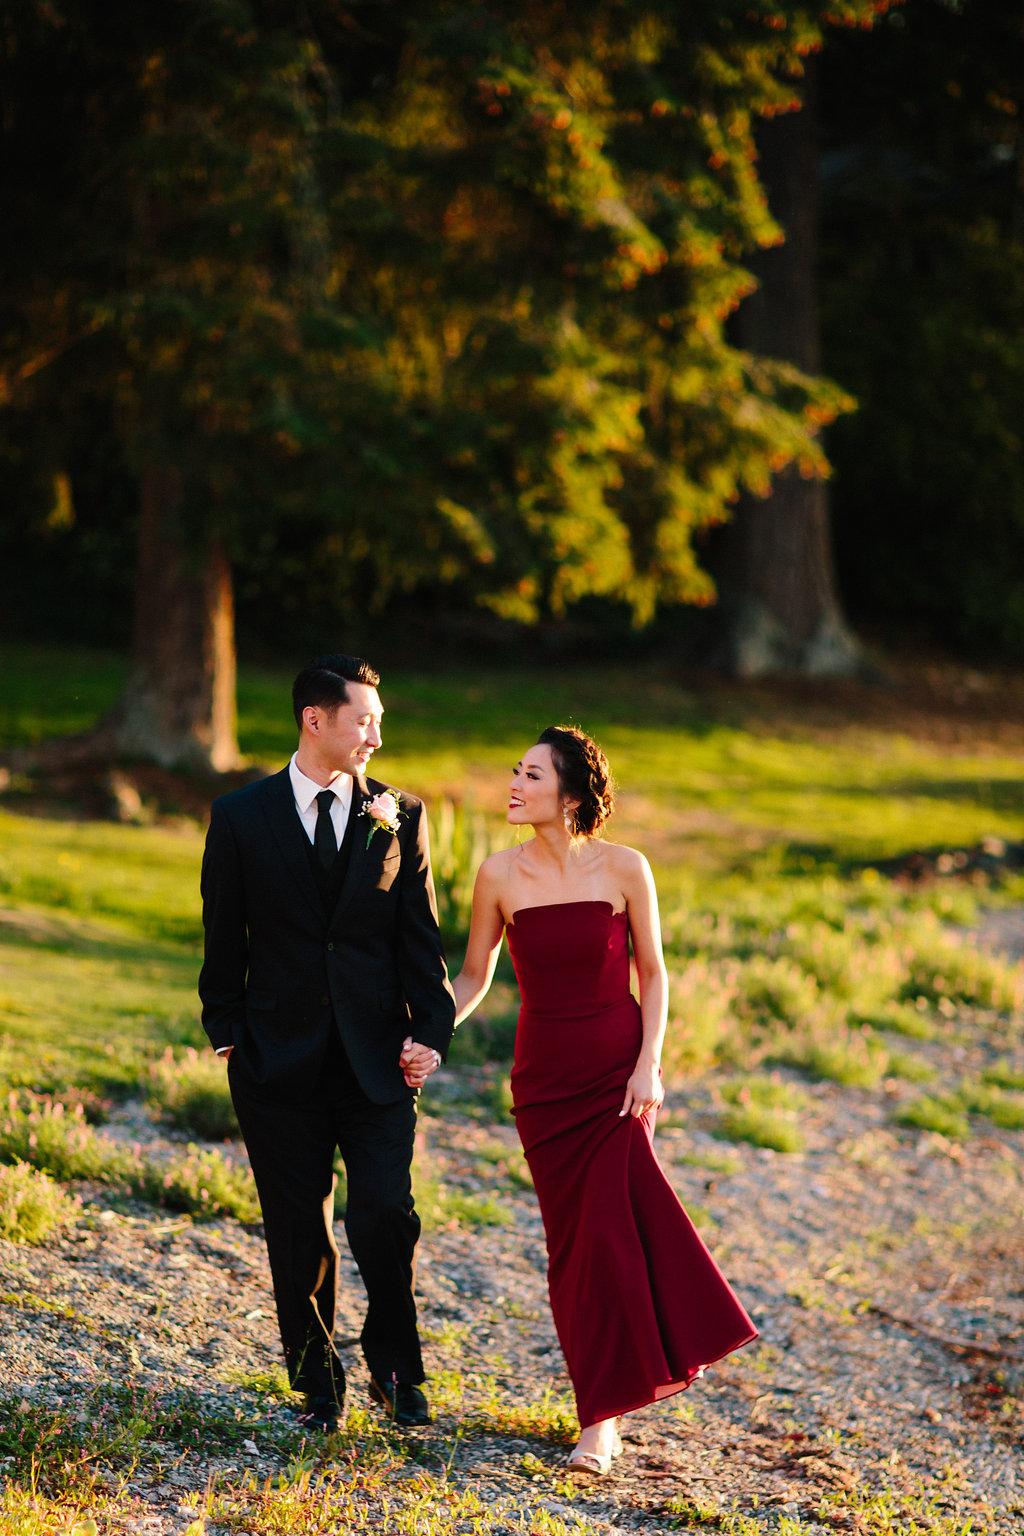 Kellylemonphotography_lucy+kento_weddingpreviews-51.jpg